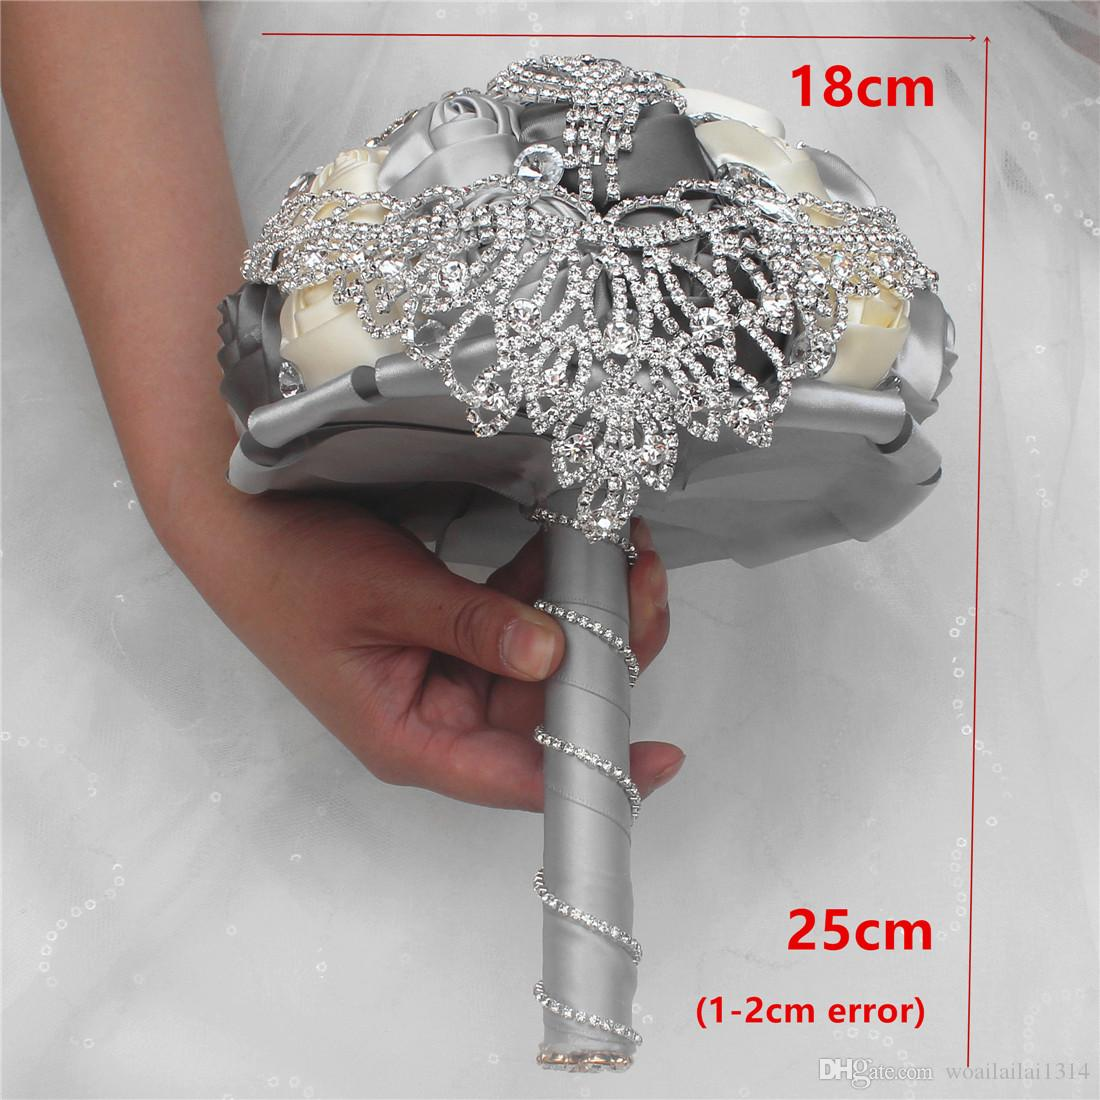 Exquisite Luxury Wedding Bouquet Drop Diamond Handmade Flowers Brooch Bouquet Fashion Wedding Bouquet For Sale W288